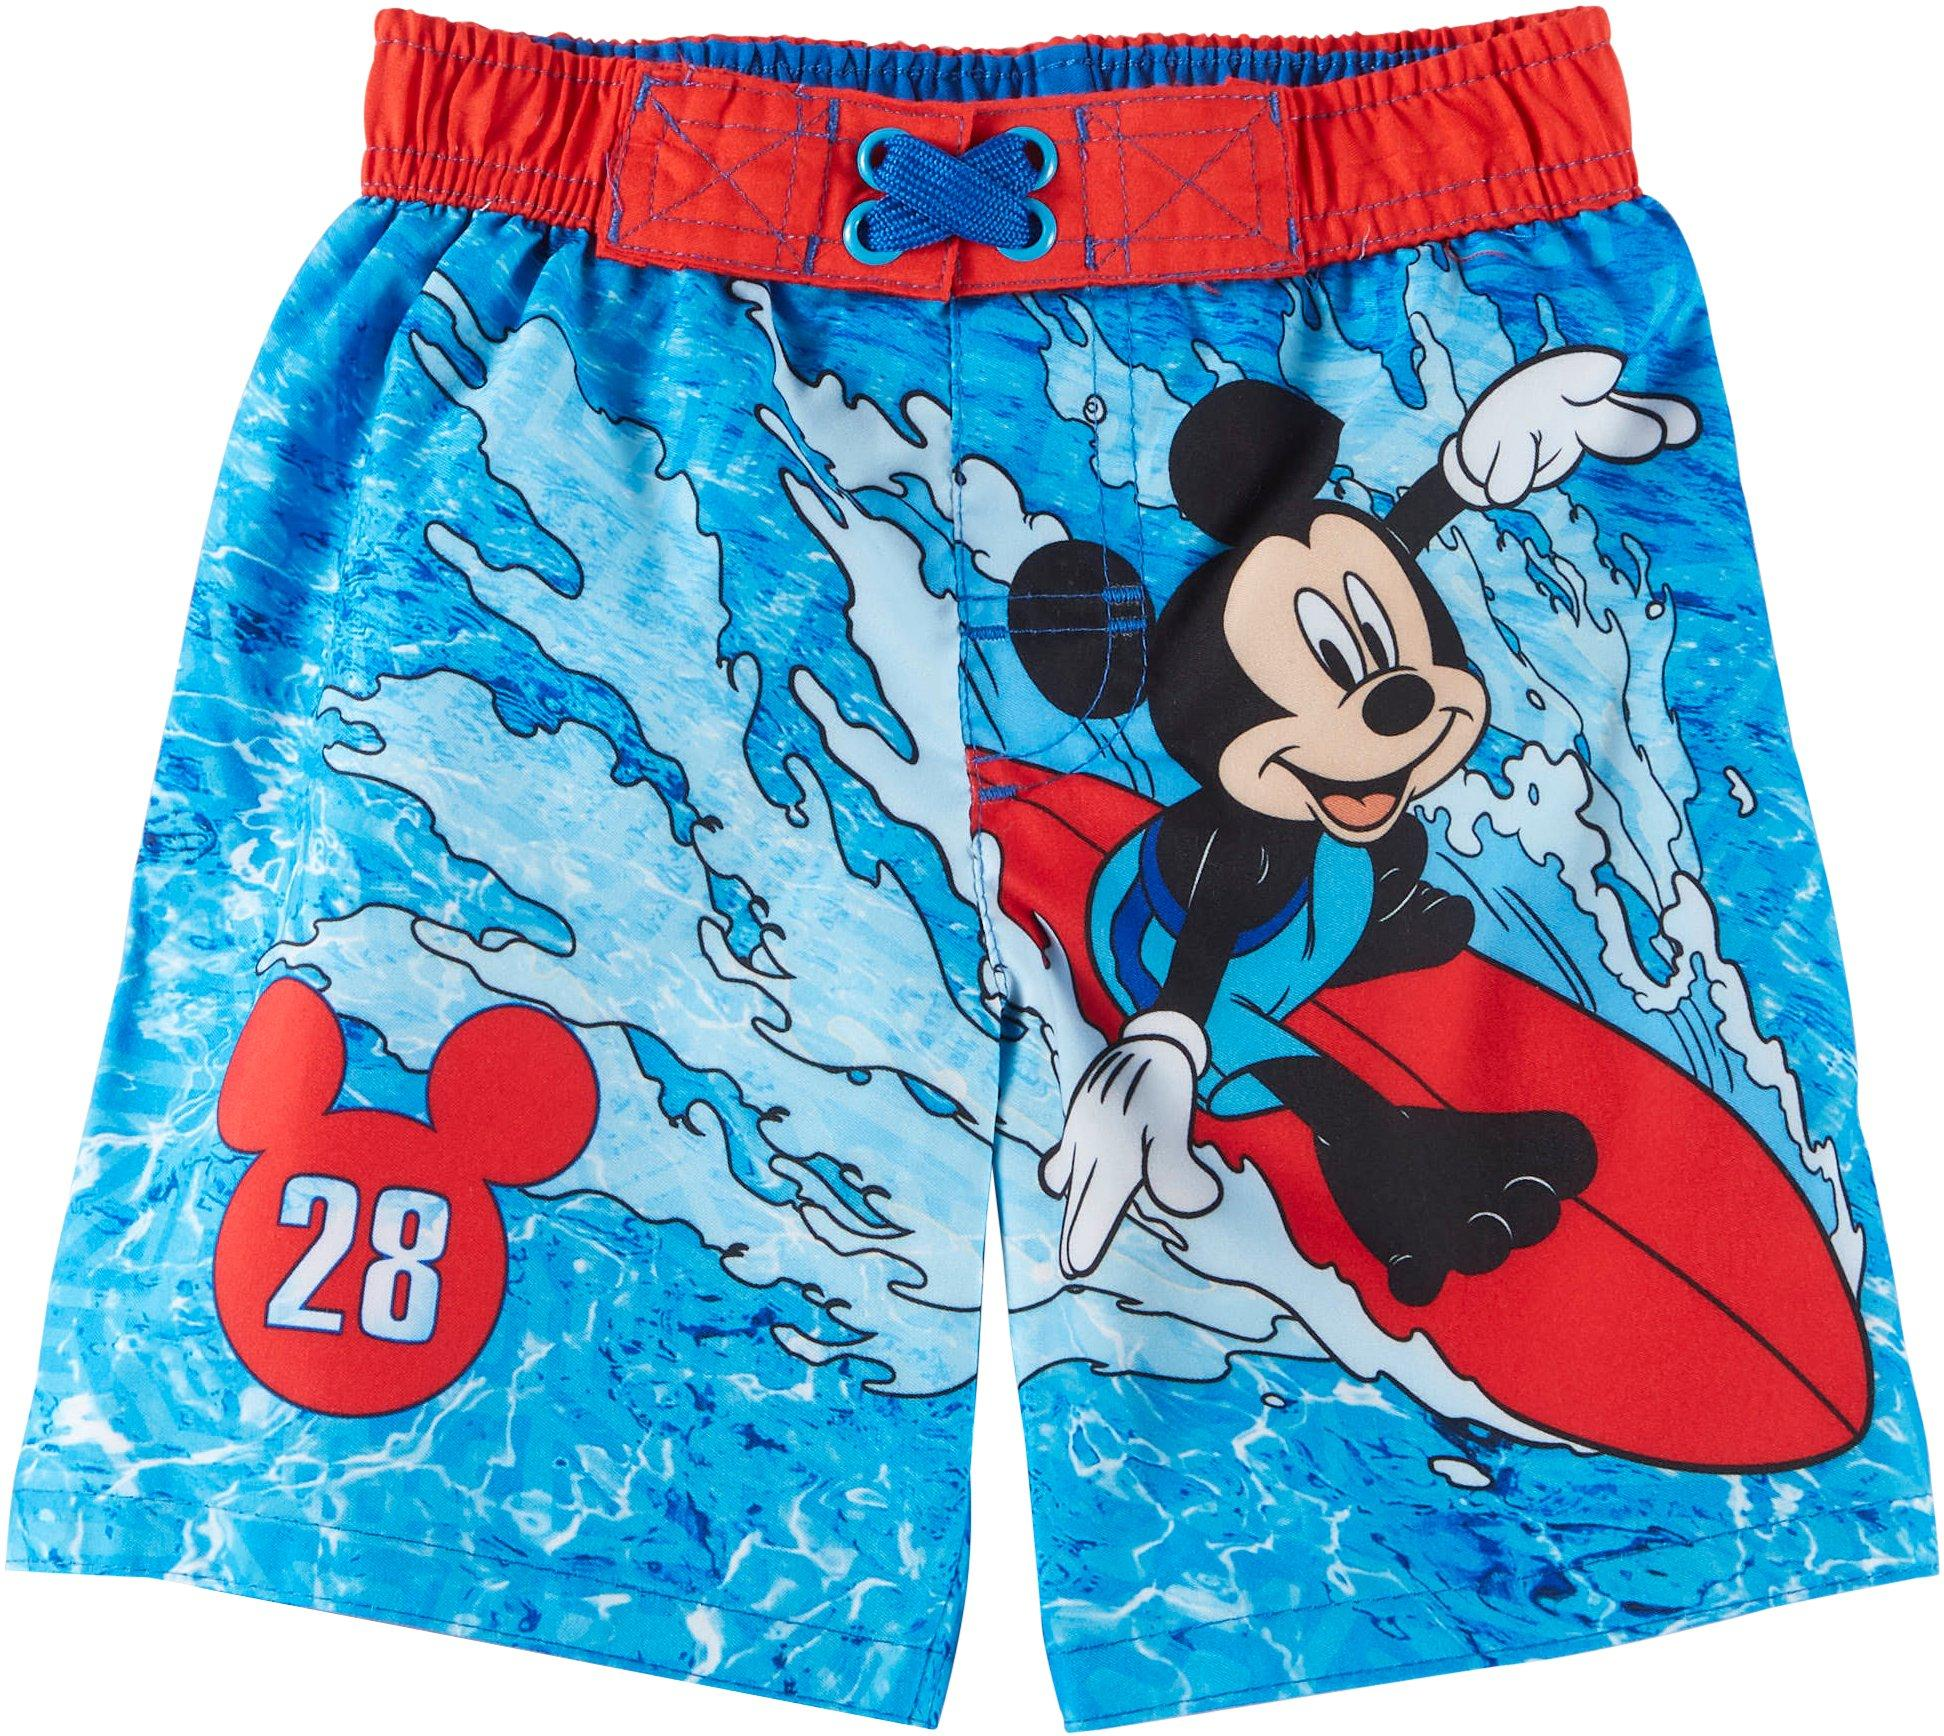 Disney Mickey Mouse Swim Trunks For Boys Size 4